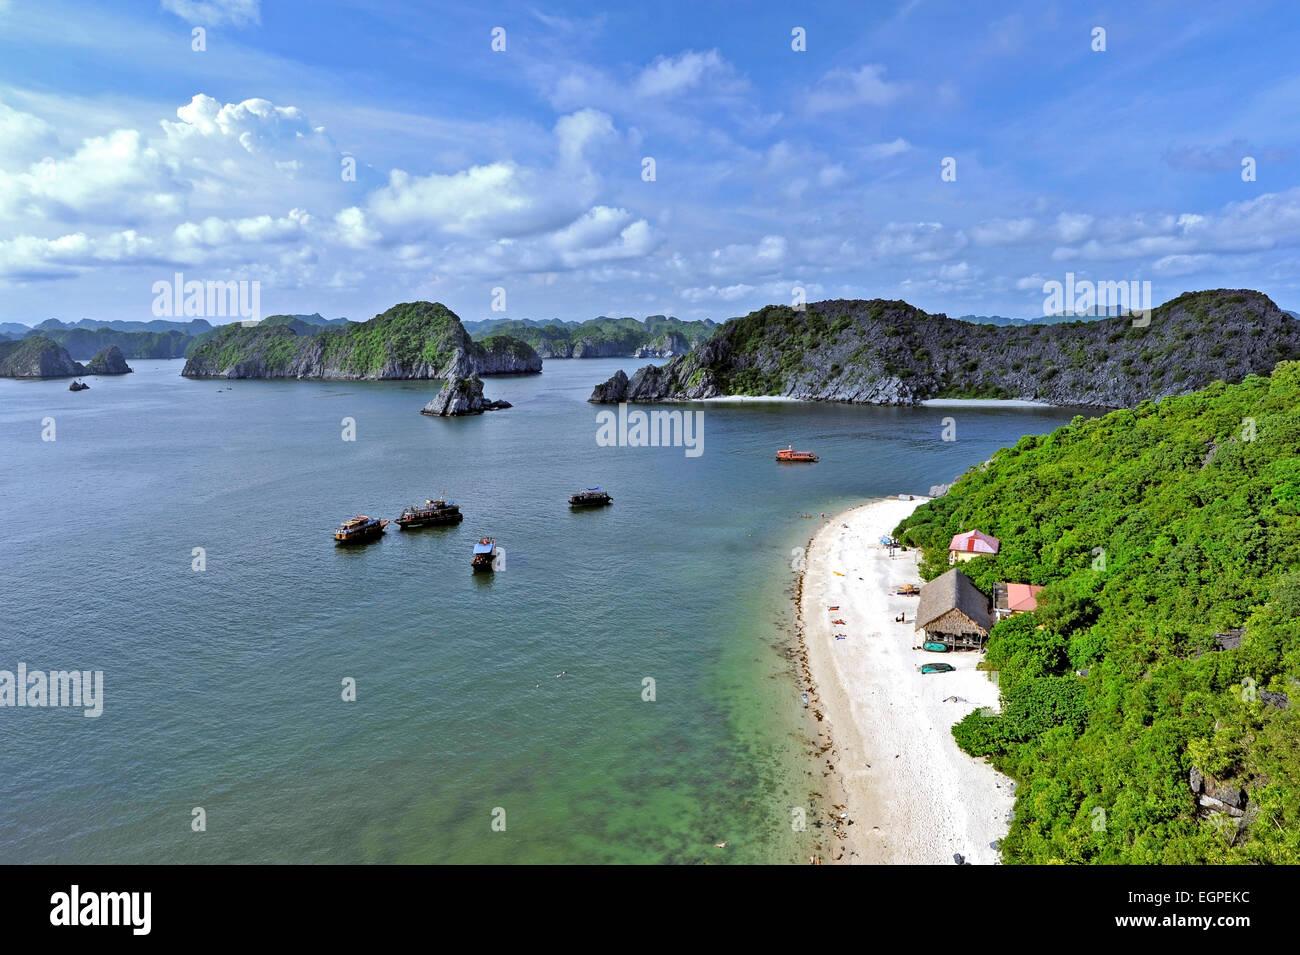 Vietnam - Halong-Bay-Nationalpark (UNESCO). Der beliebteste Ort in Vietnam. Affeninsel. Stockbild